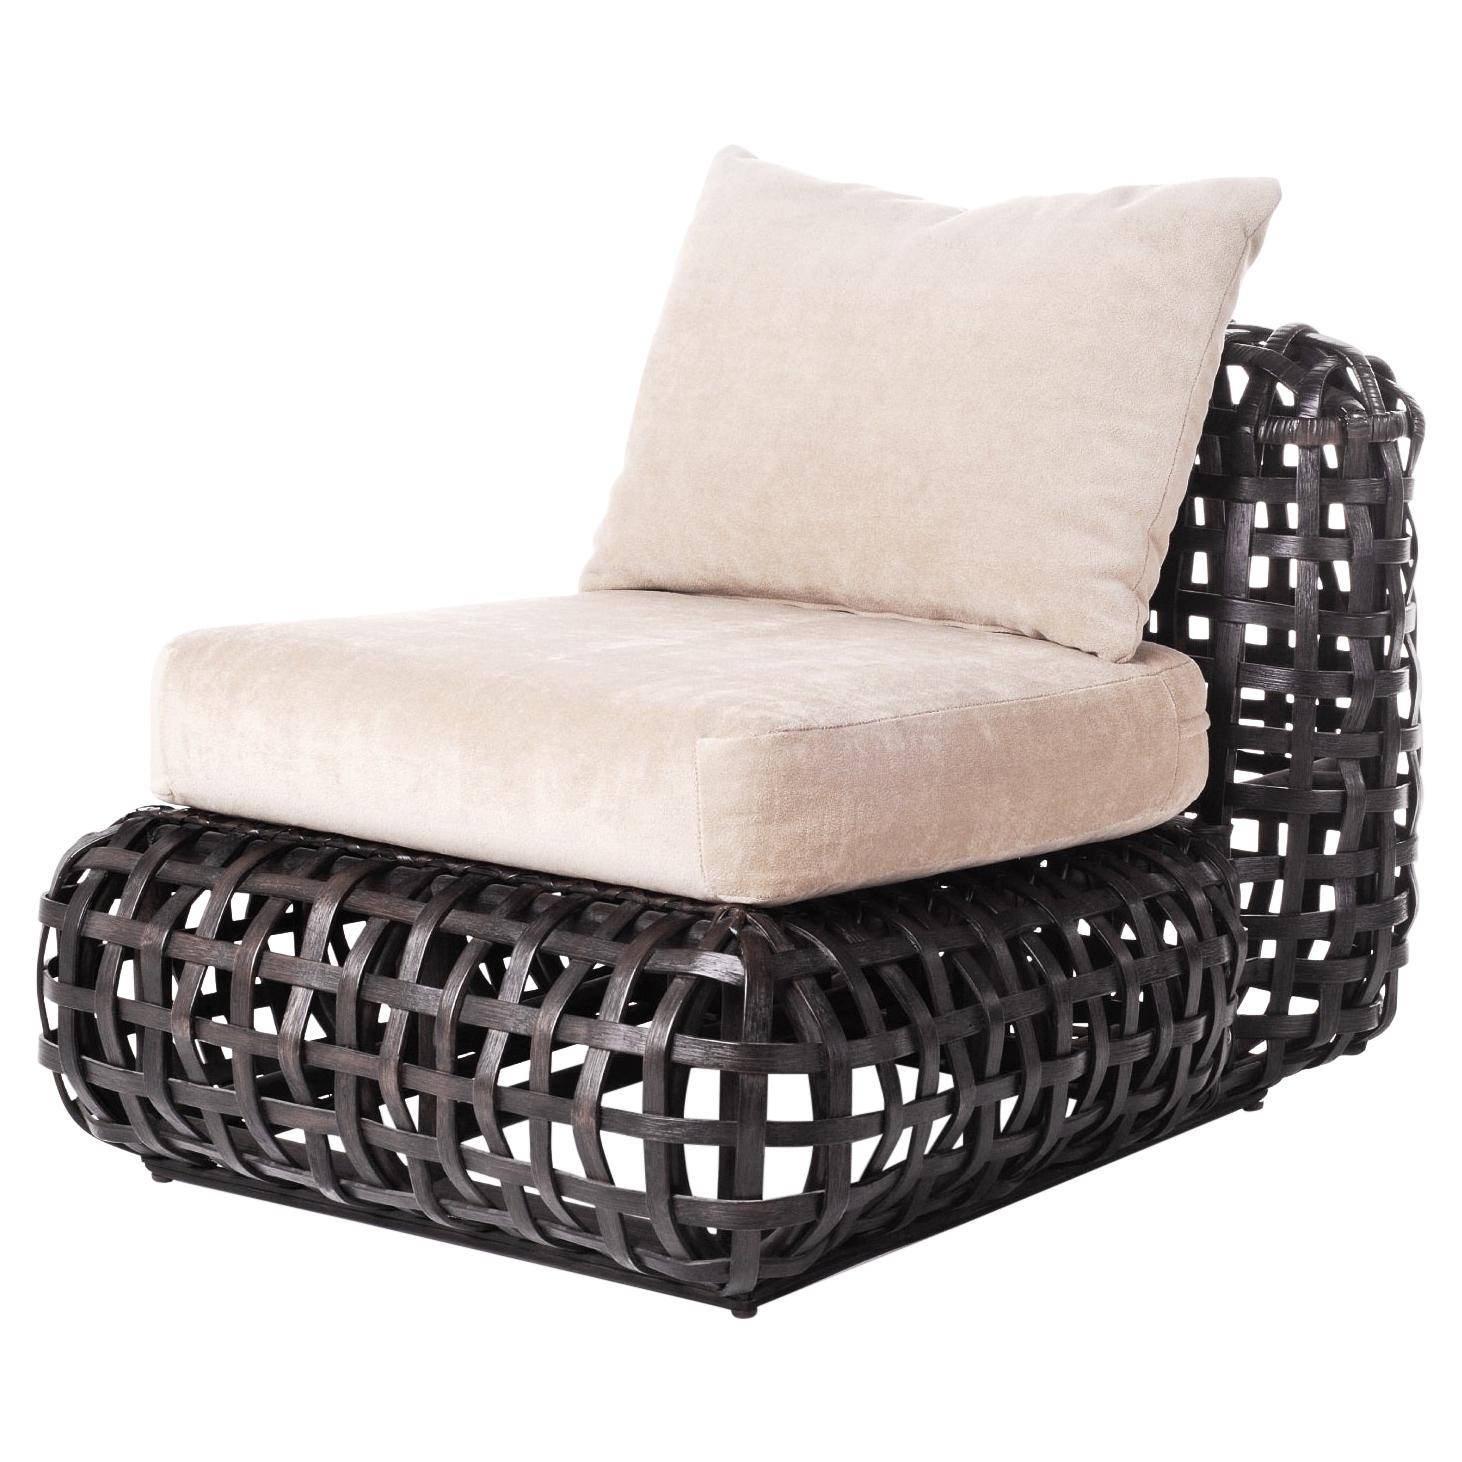 Indoor Matilda Easy Chair by Kenneth Cobonpue